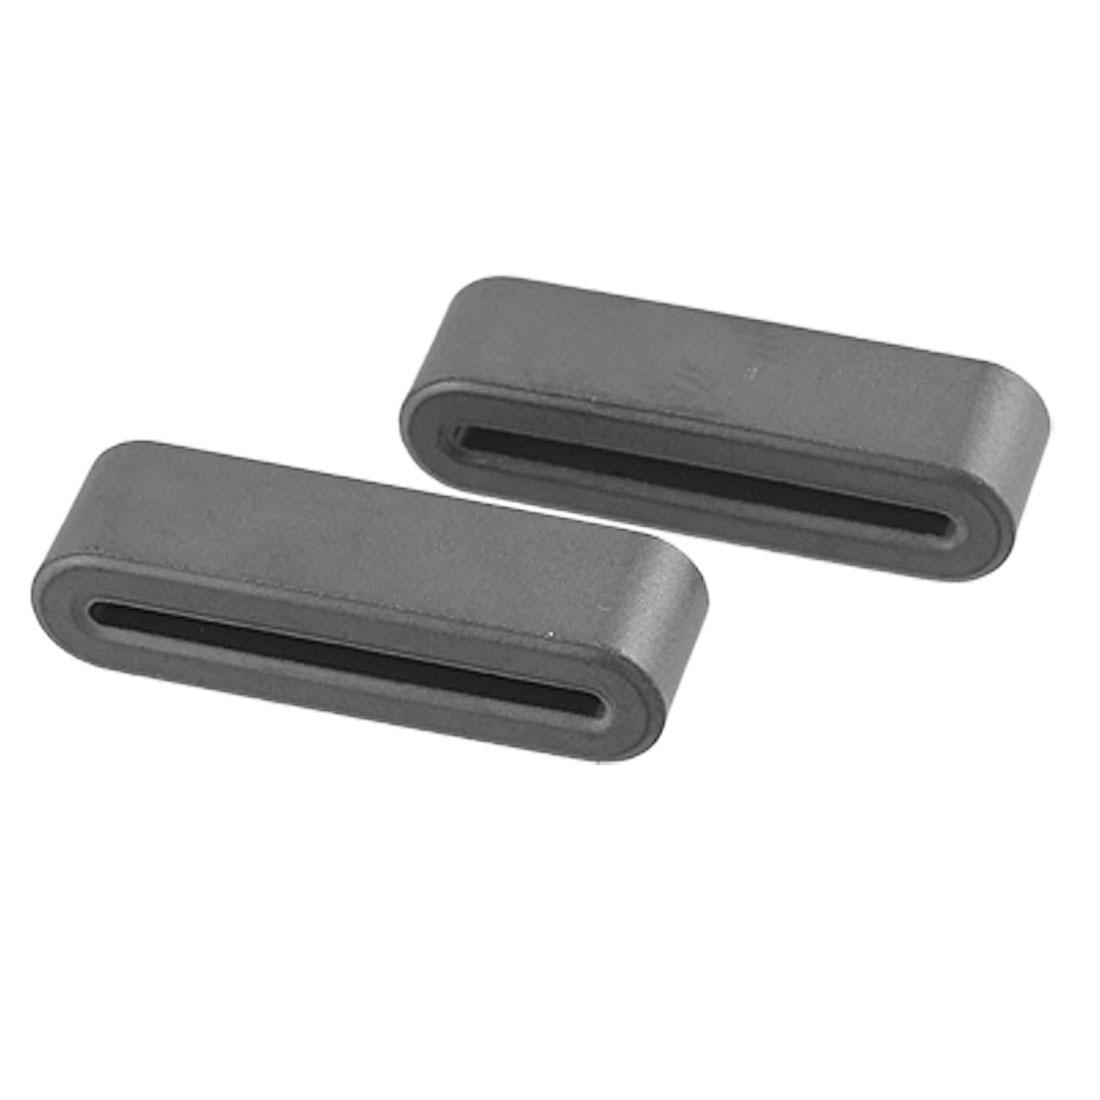 6 x Transformer Filter Coils 27 x 8 x 6.5mm Ferrite Flat Cable Core